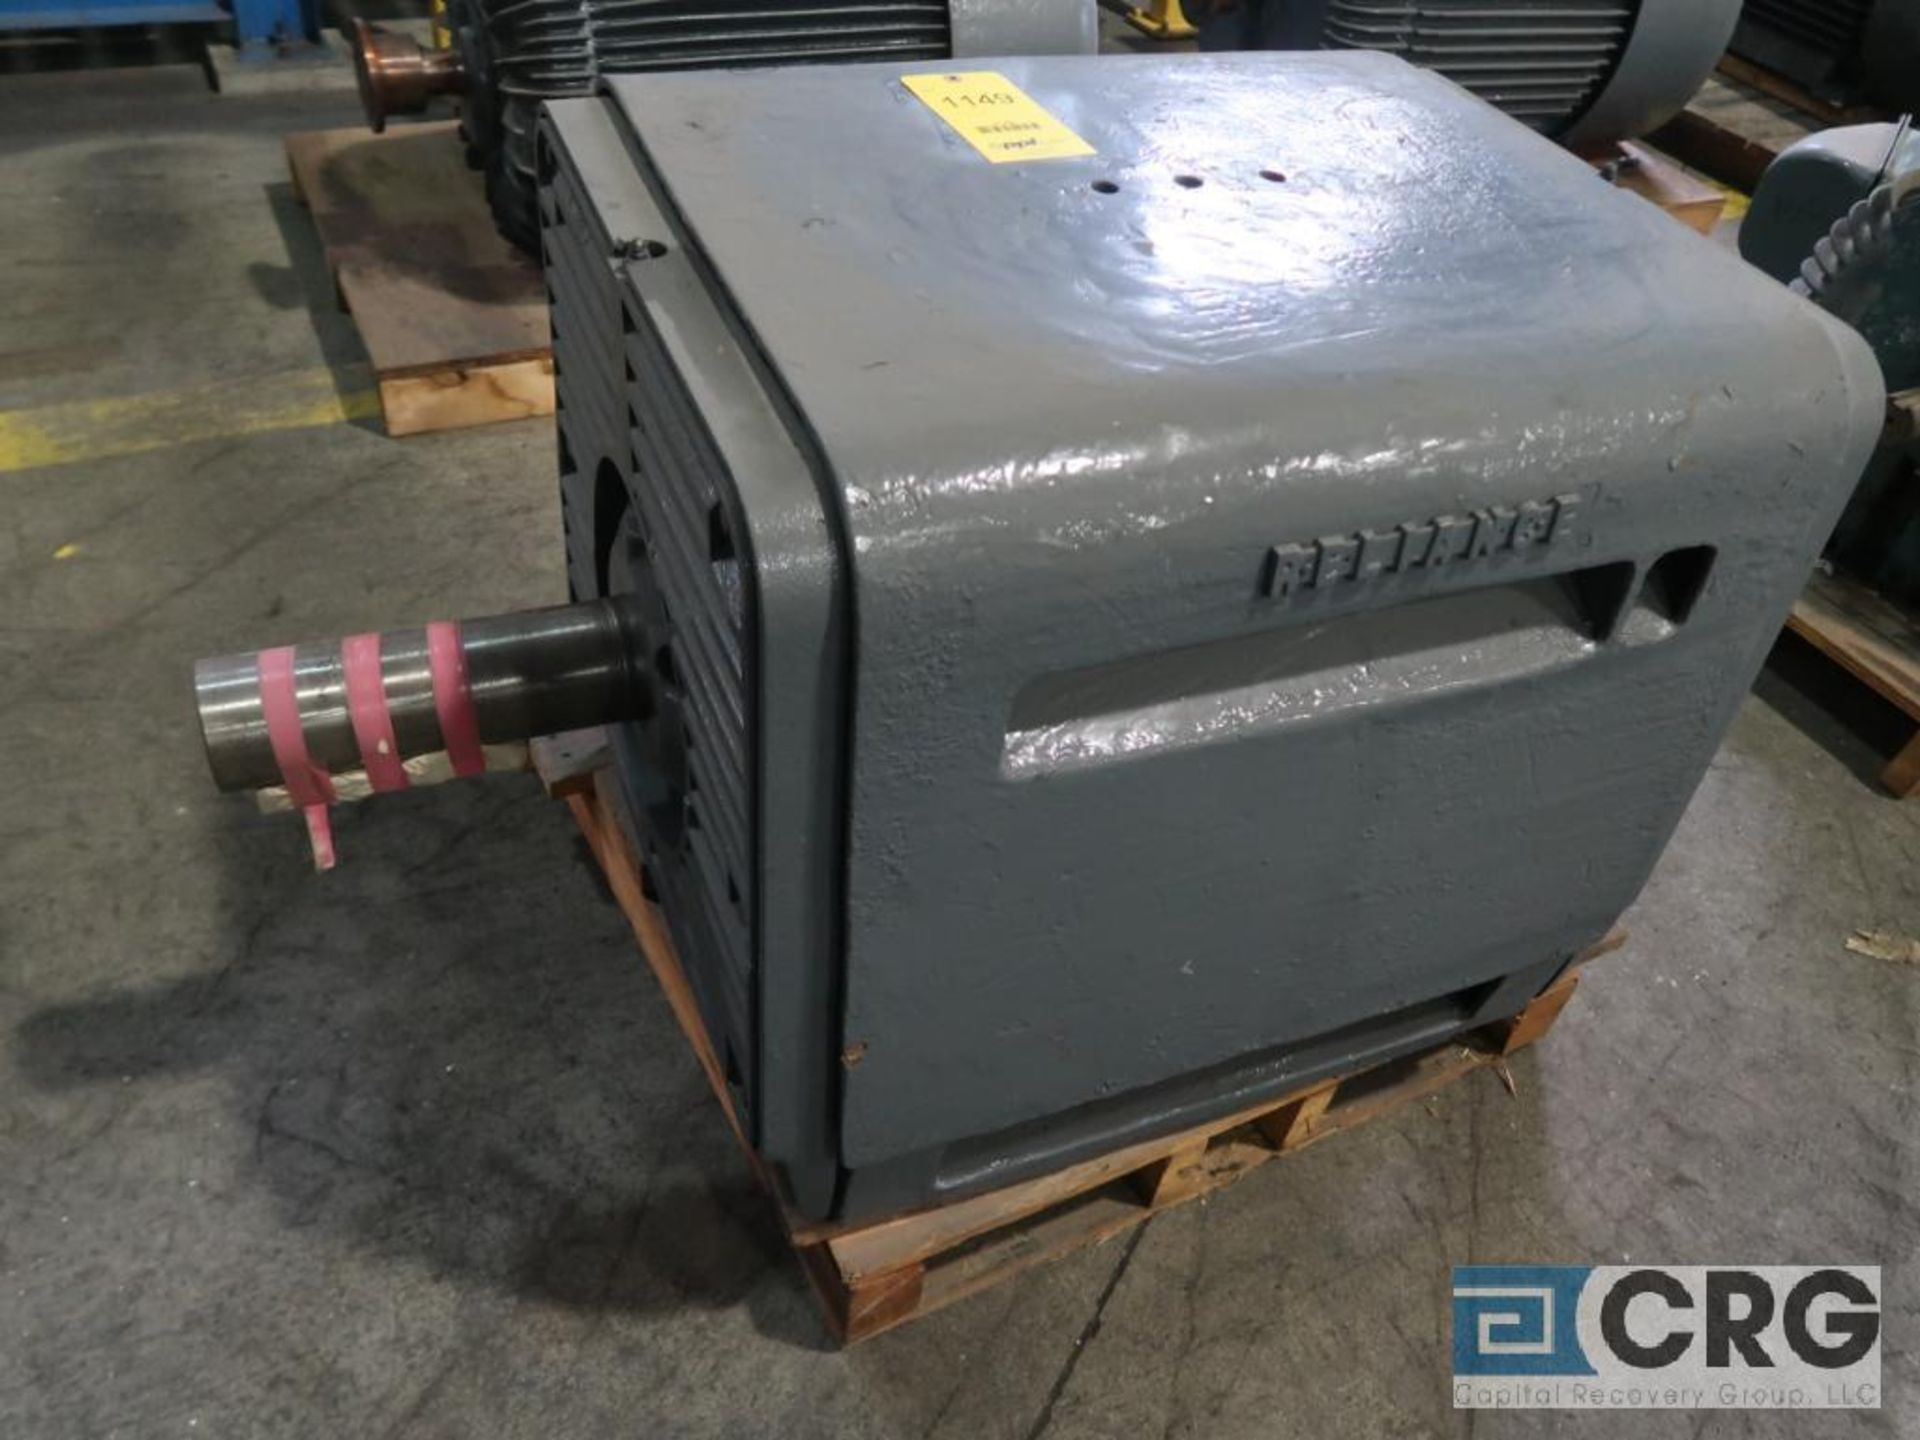 Reliance Duty Master motor, 150 HP, 1,180 RPMs, 208 volt, 3 ph., 5003 frame (Finish Building)